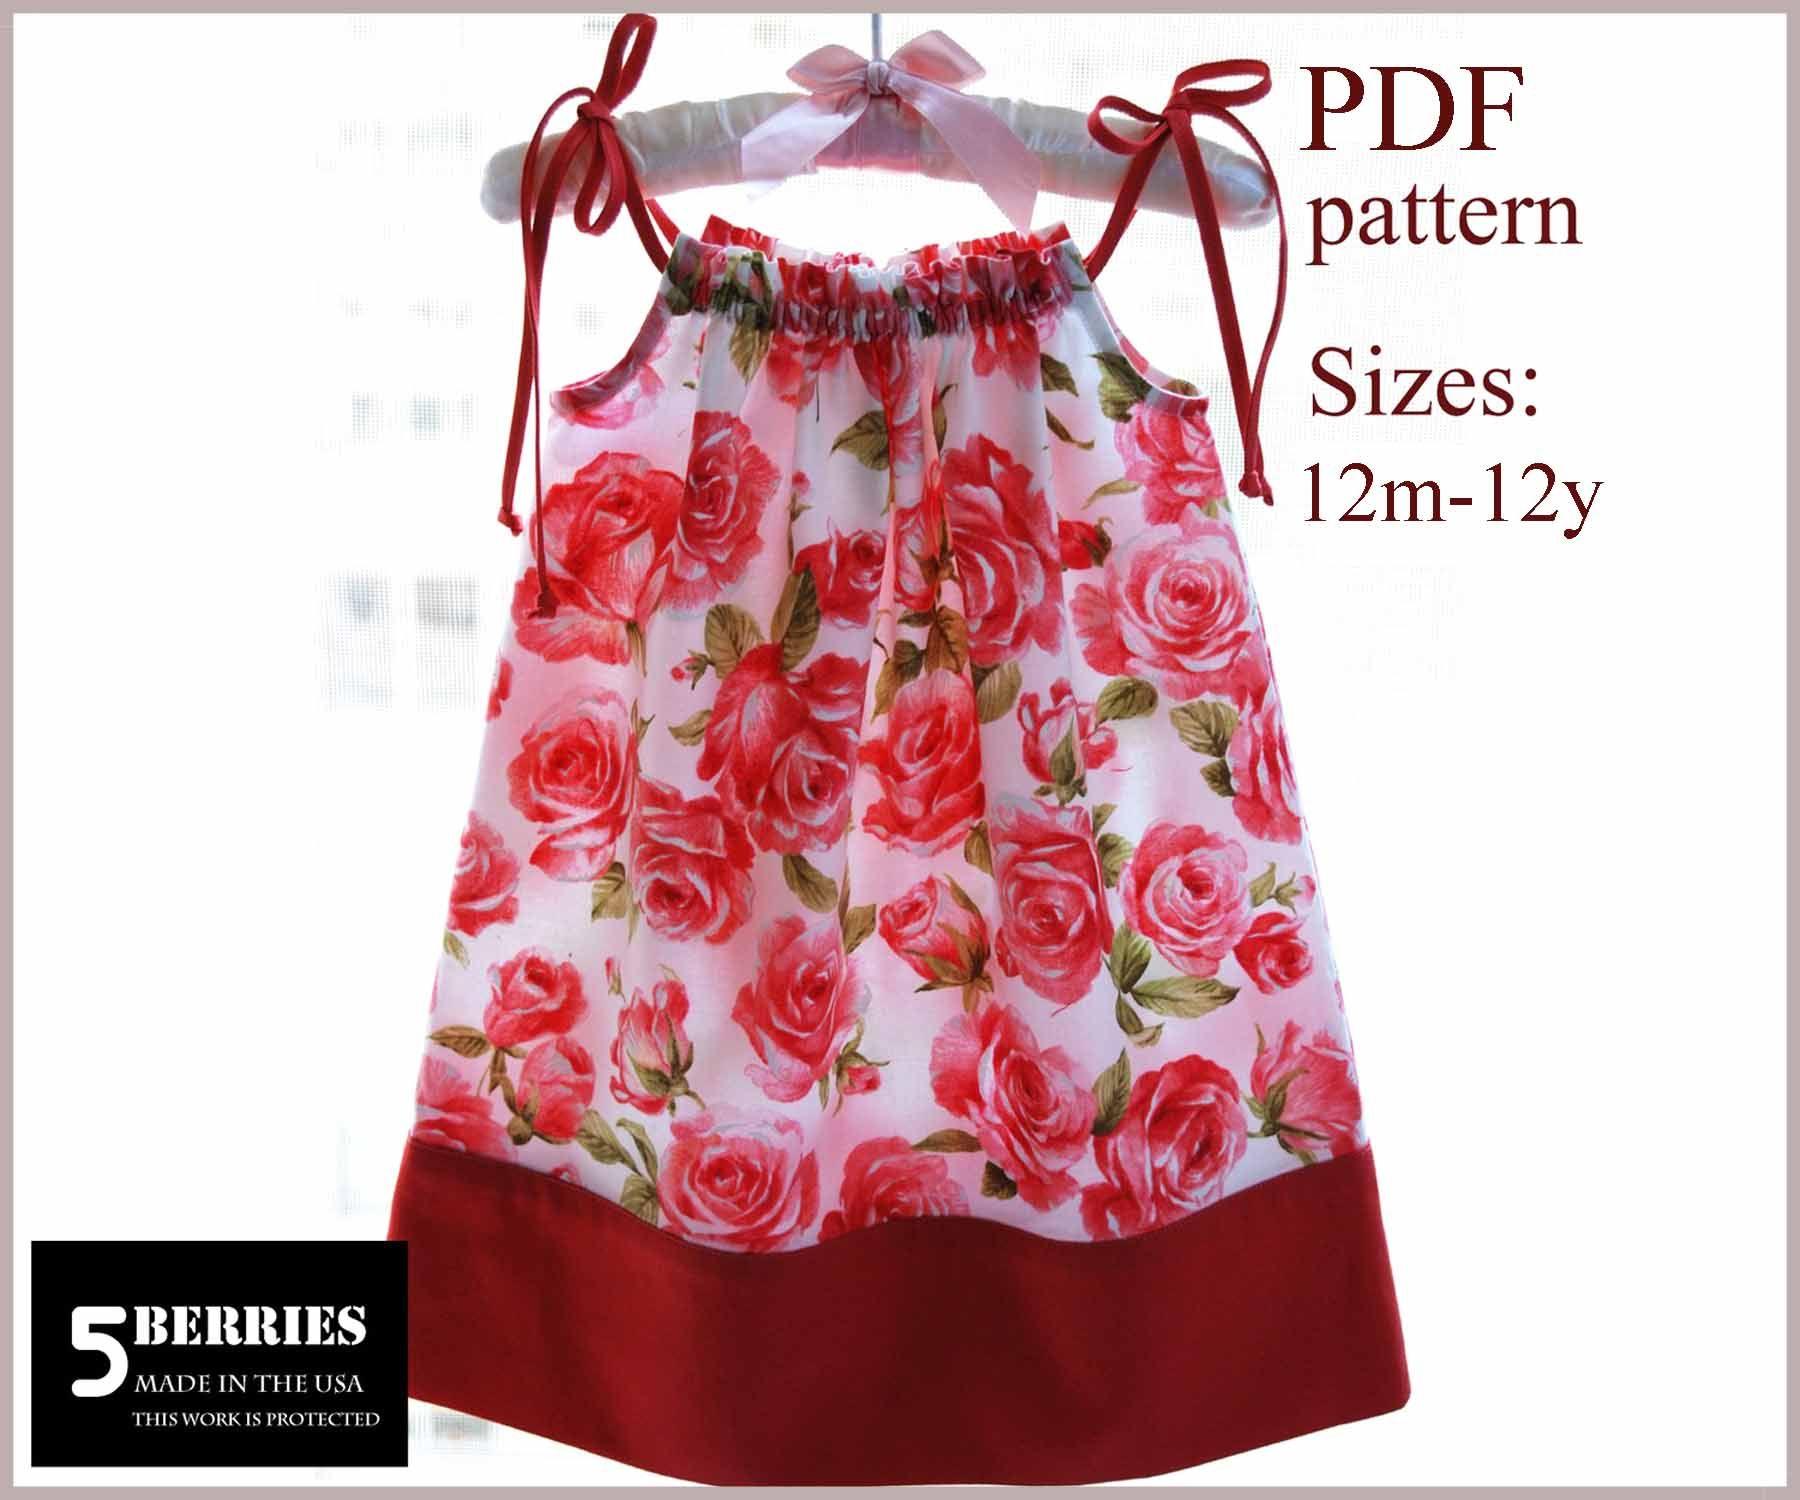 Pillowcase Dress Pattern for little girls